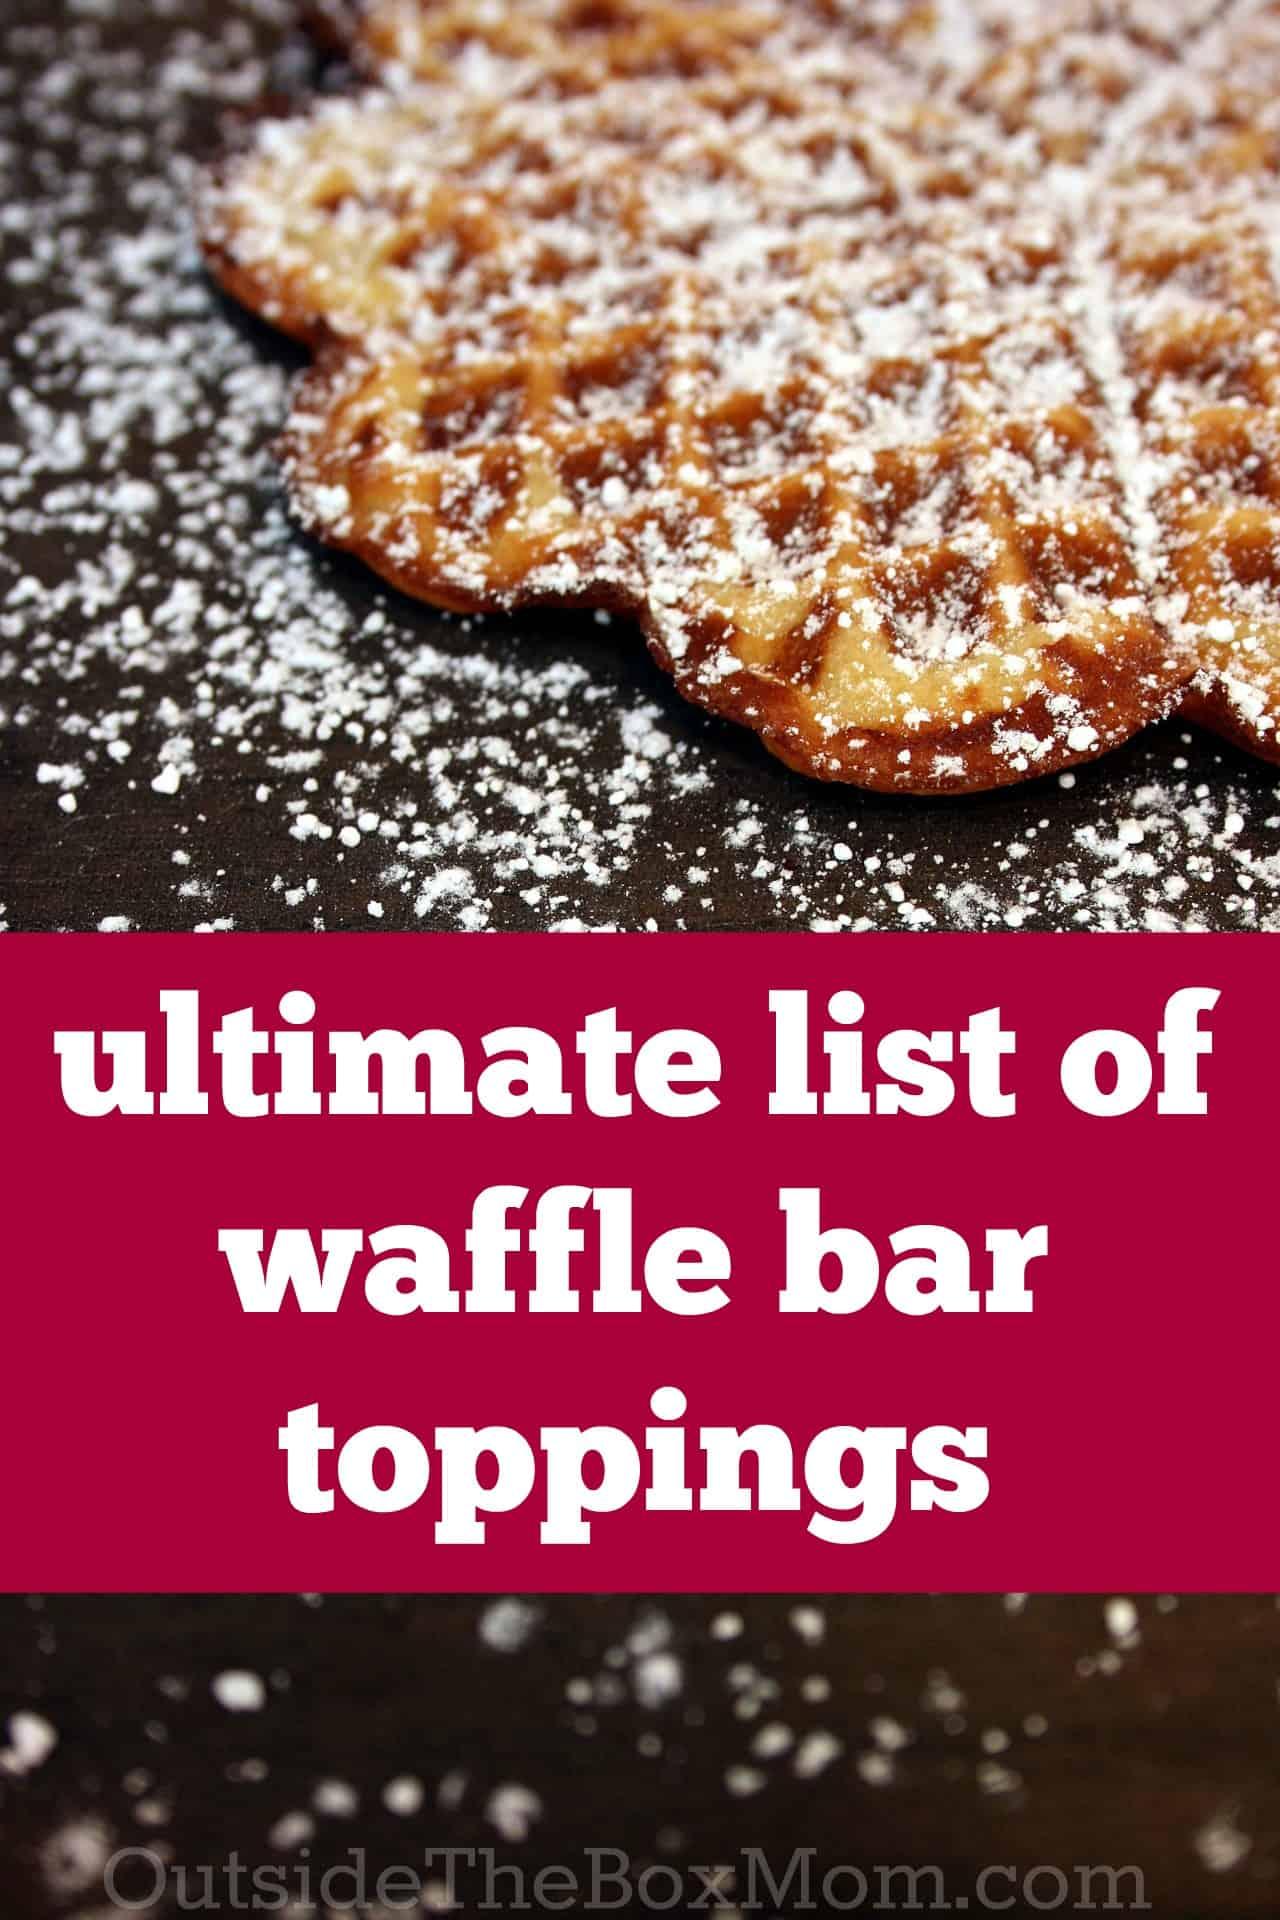 waffle-bar-toppings